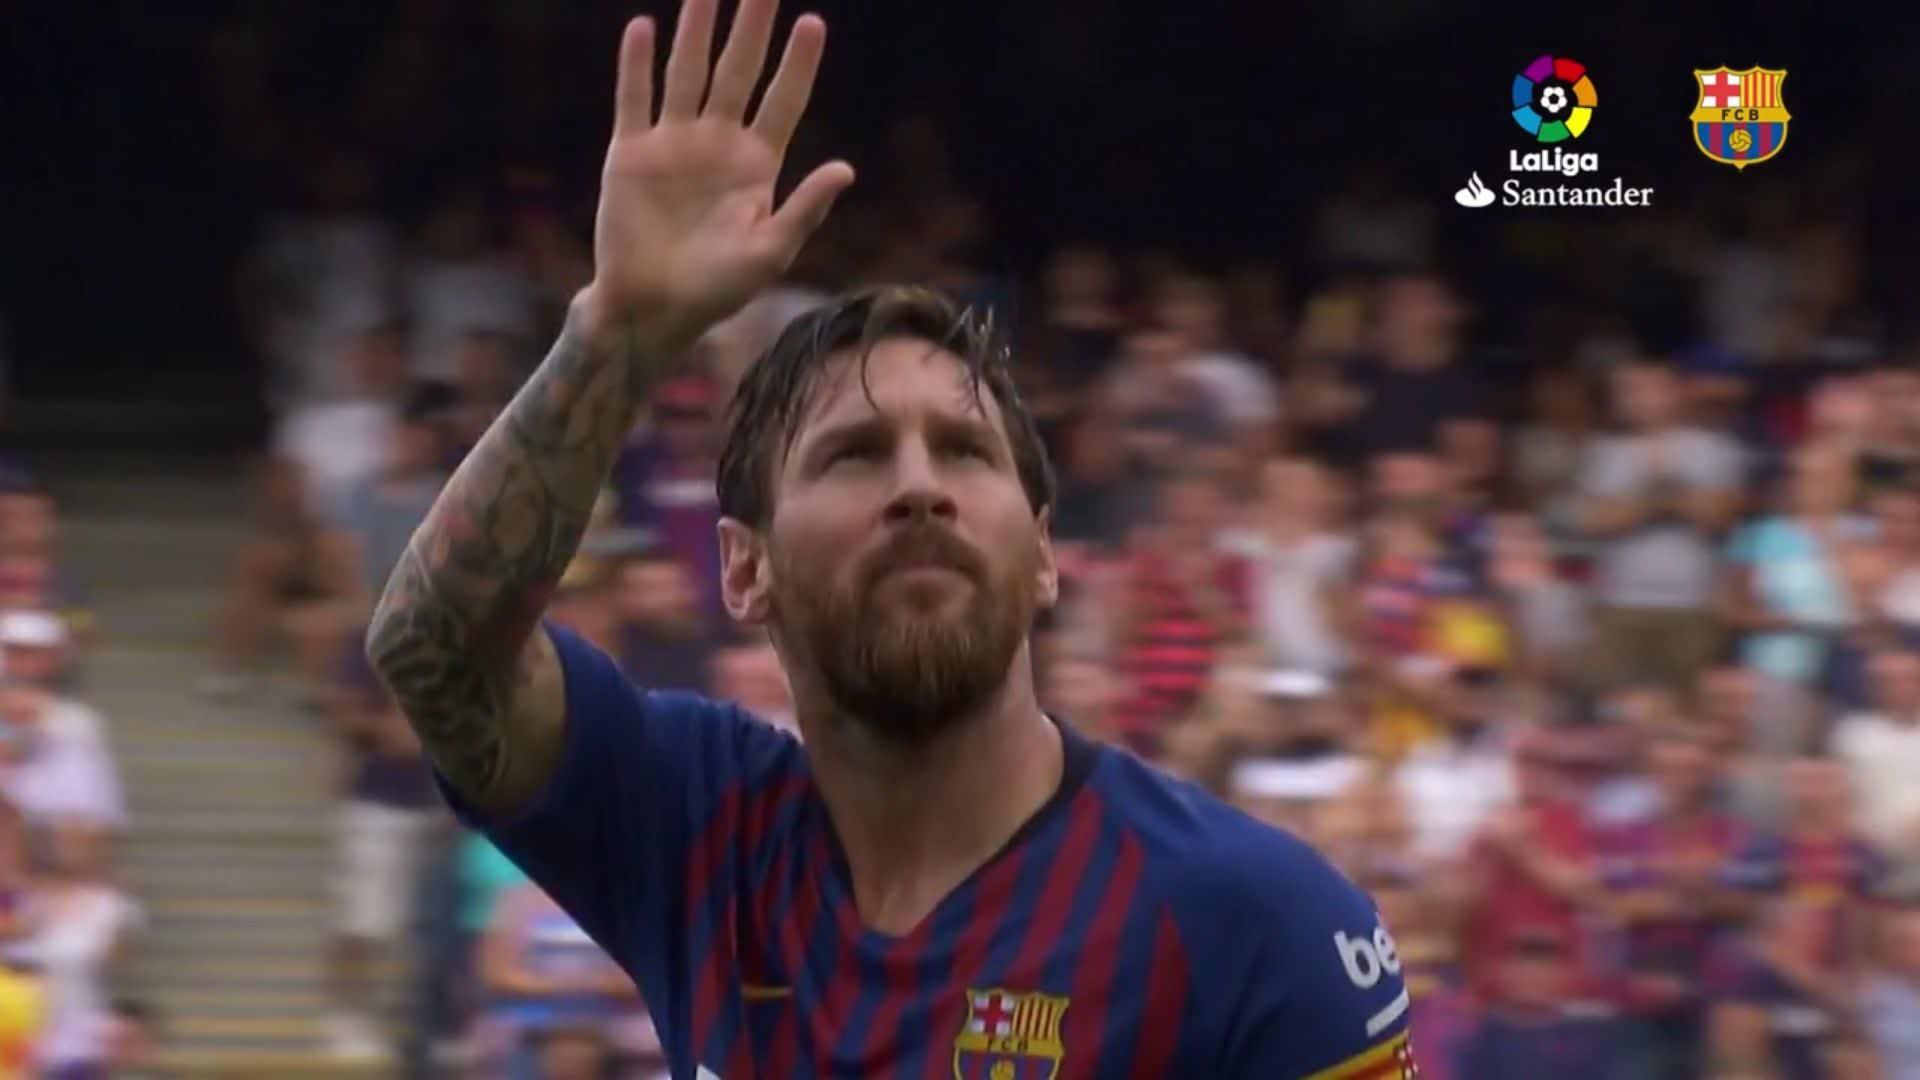 ⚽️ #BarçaSevilla  �� Enjoy at Camp Nou!  �� https://t.co/fUrFaiVlfx ���� Força Barça! https://t.co/0qj1EuoQ9Q